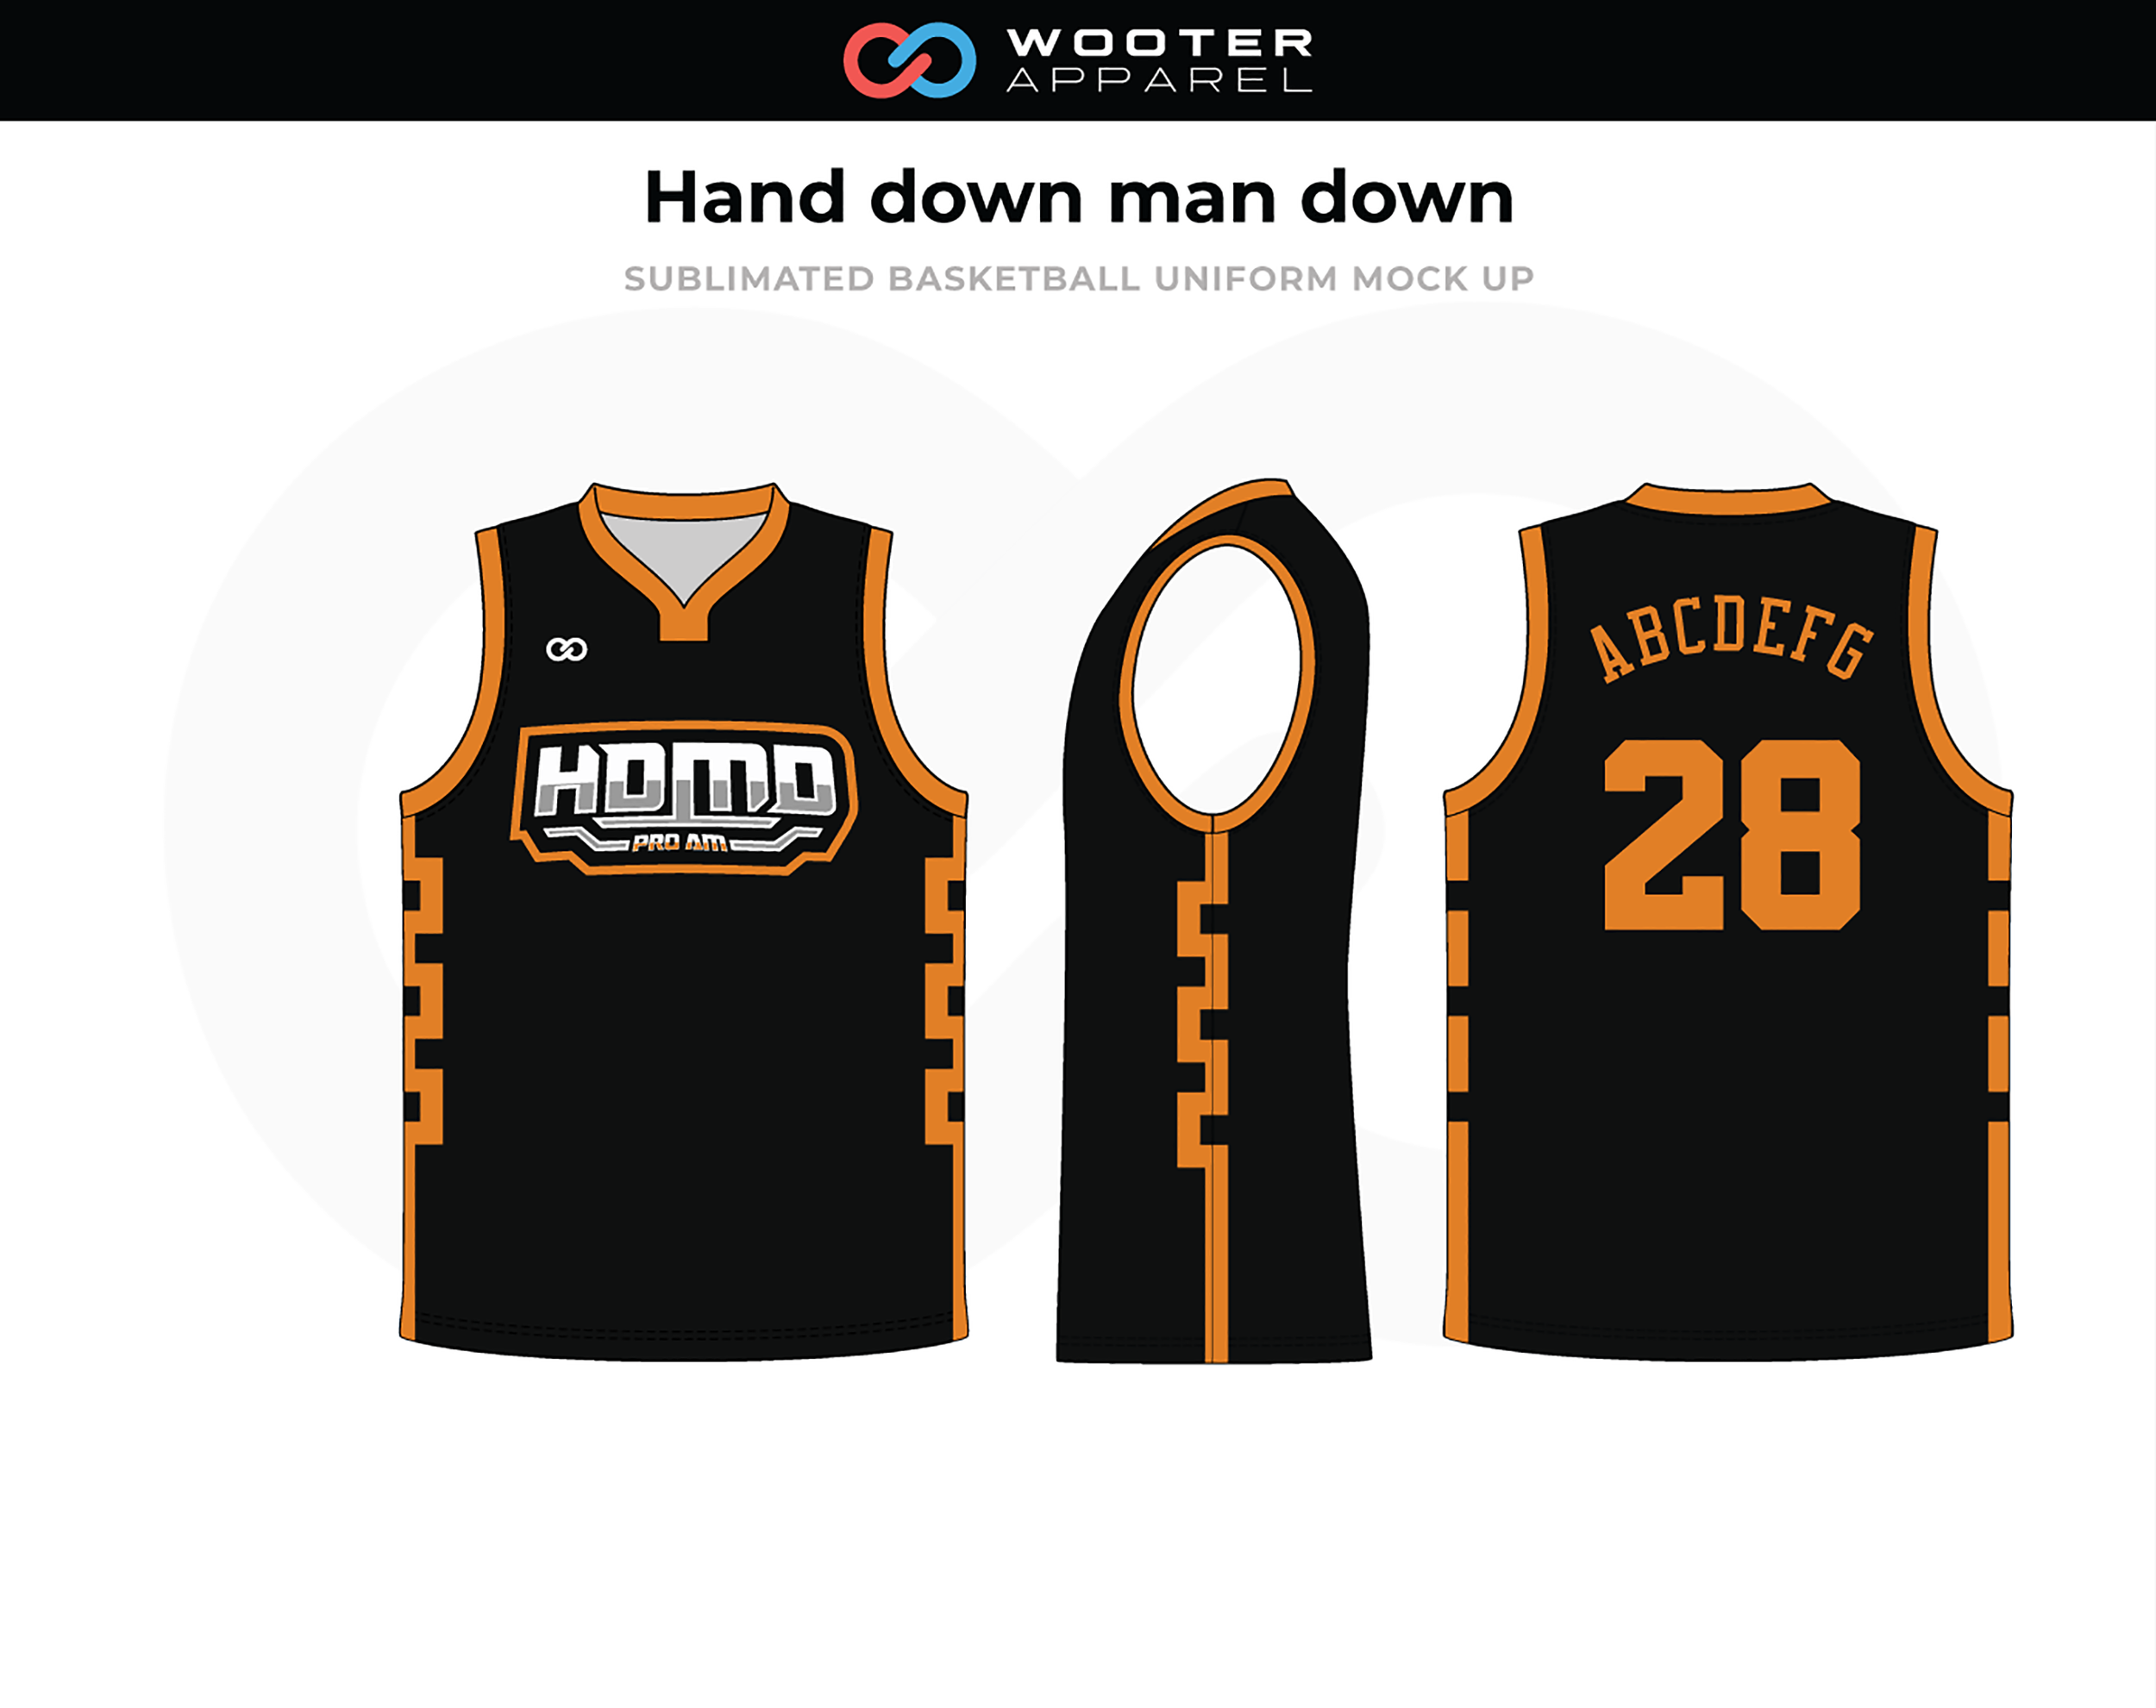 HAND DOWN MAN DOWN Black Orange White Basketball Jersey